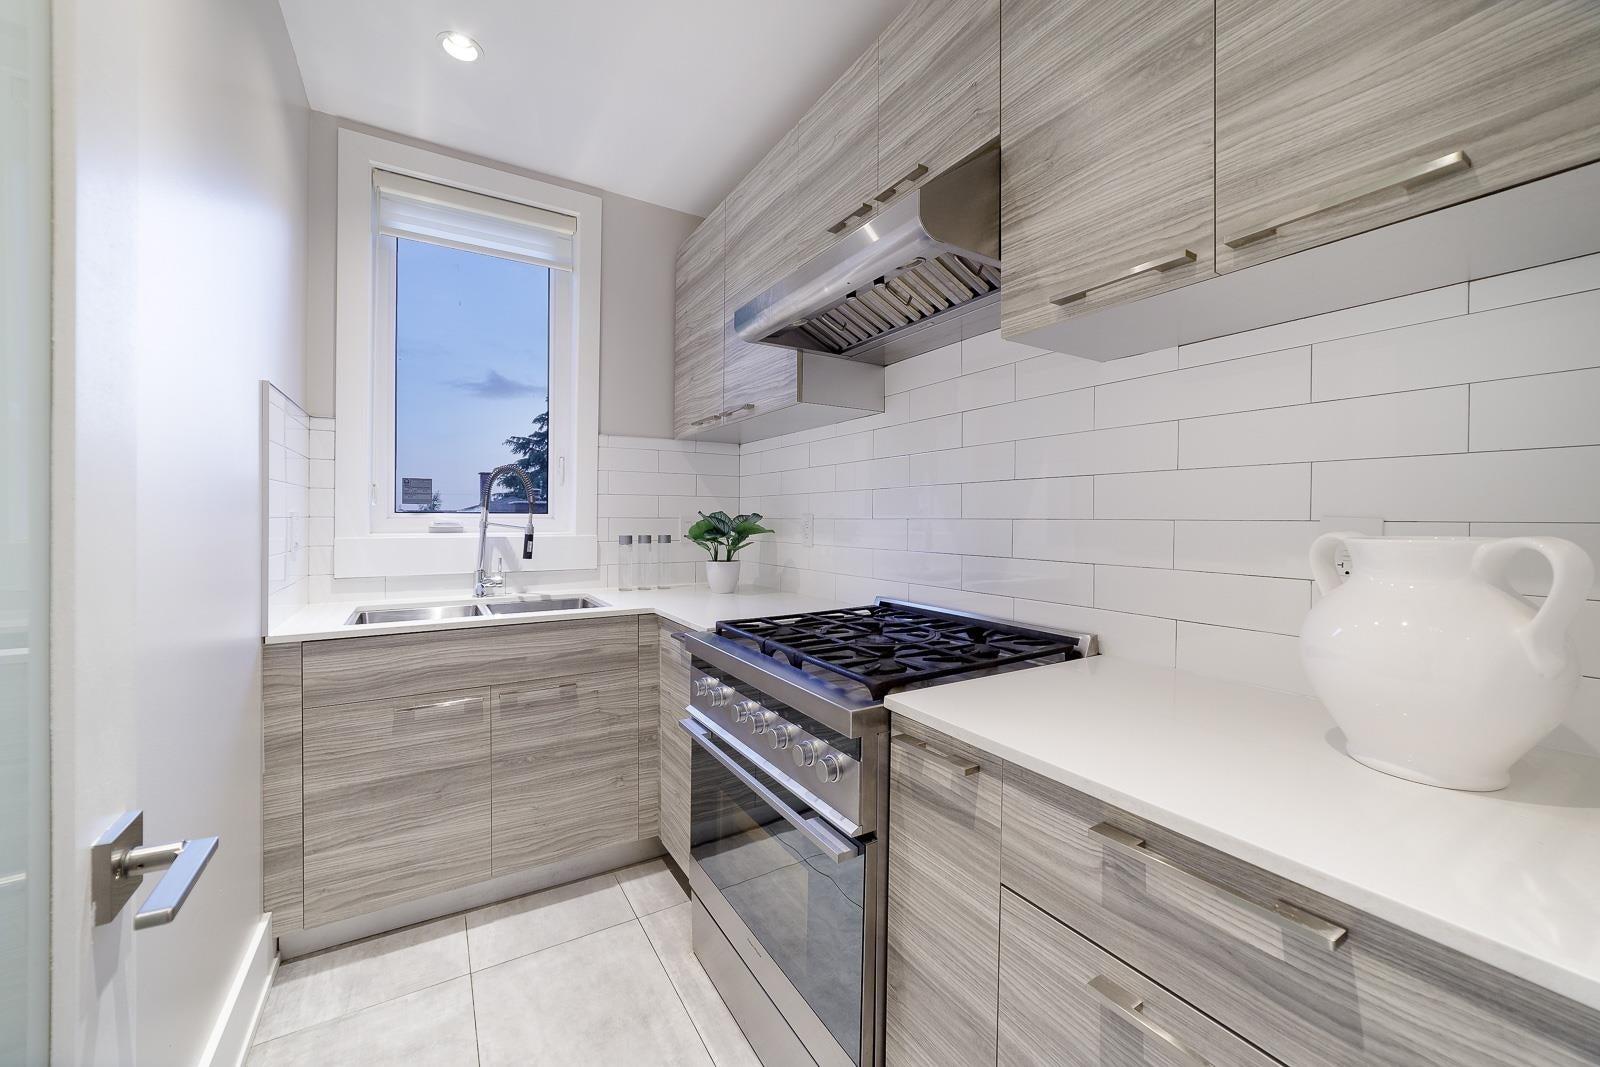 517 GRANADA CRESCENT - Upper Delbrook House/Single Family for sale, 8 Bedrooms (R2615057) - #10